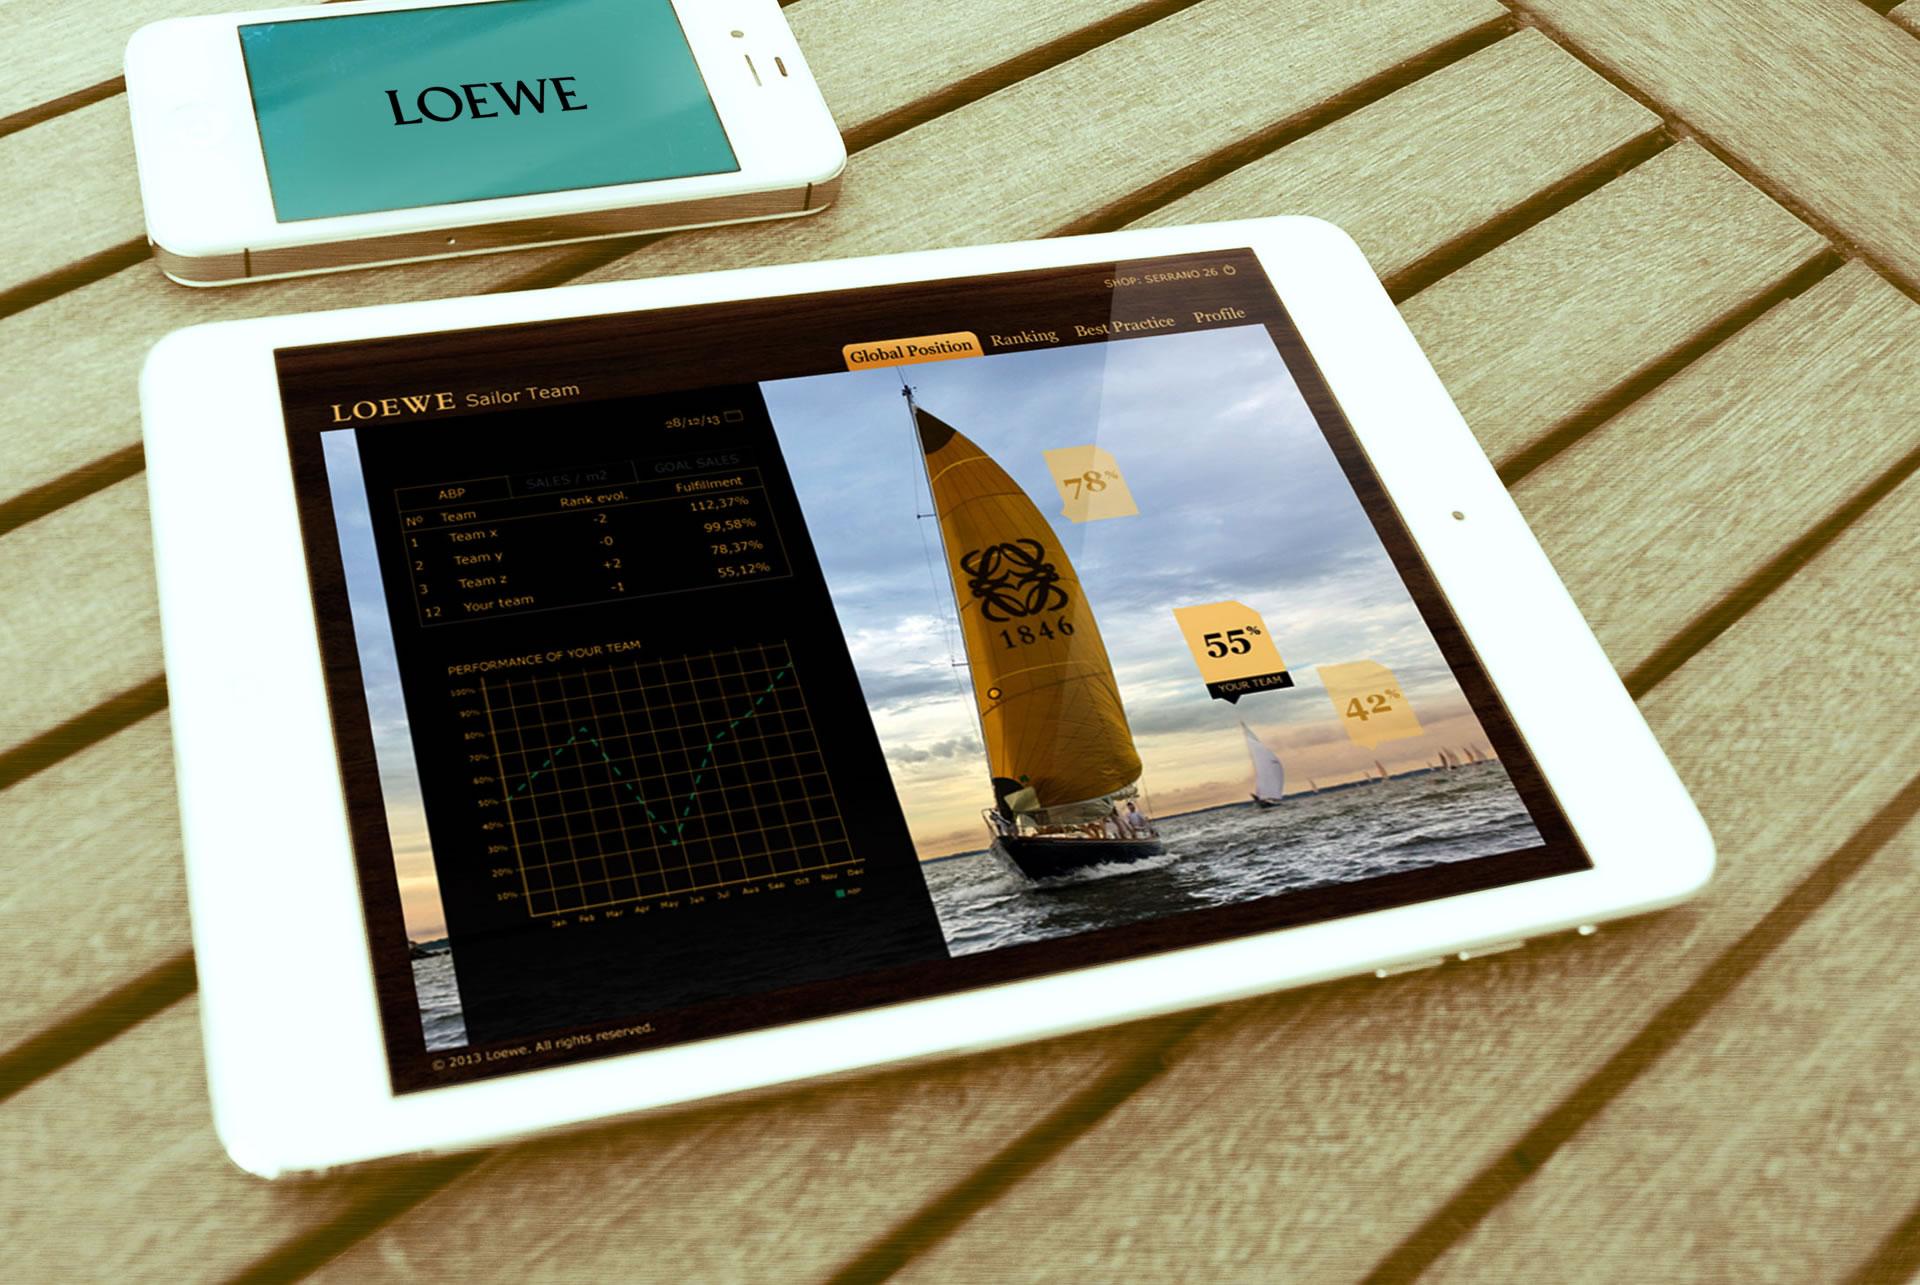 Loewe-babel-gamification-dinamizacion-comercial